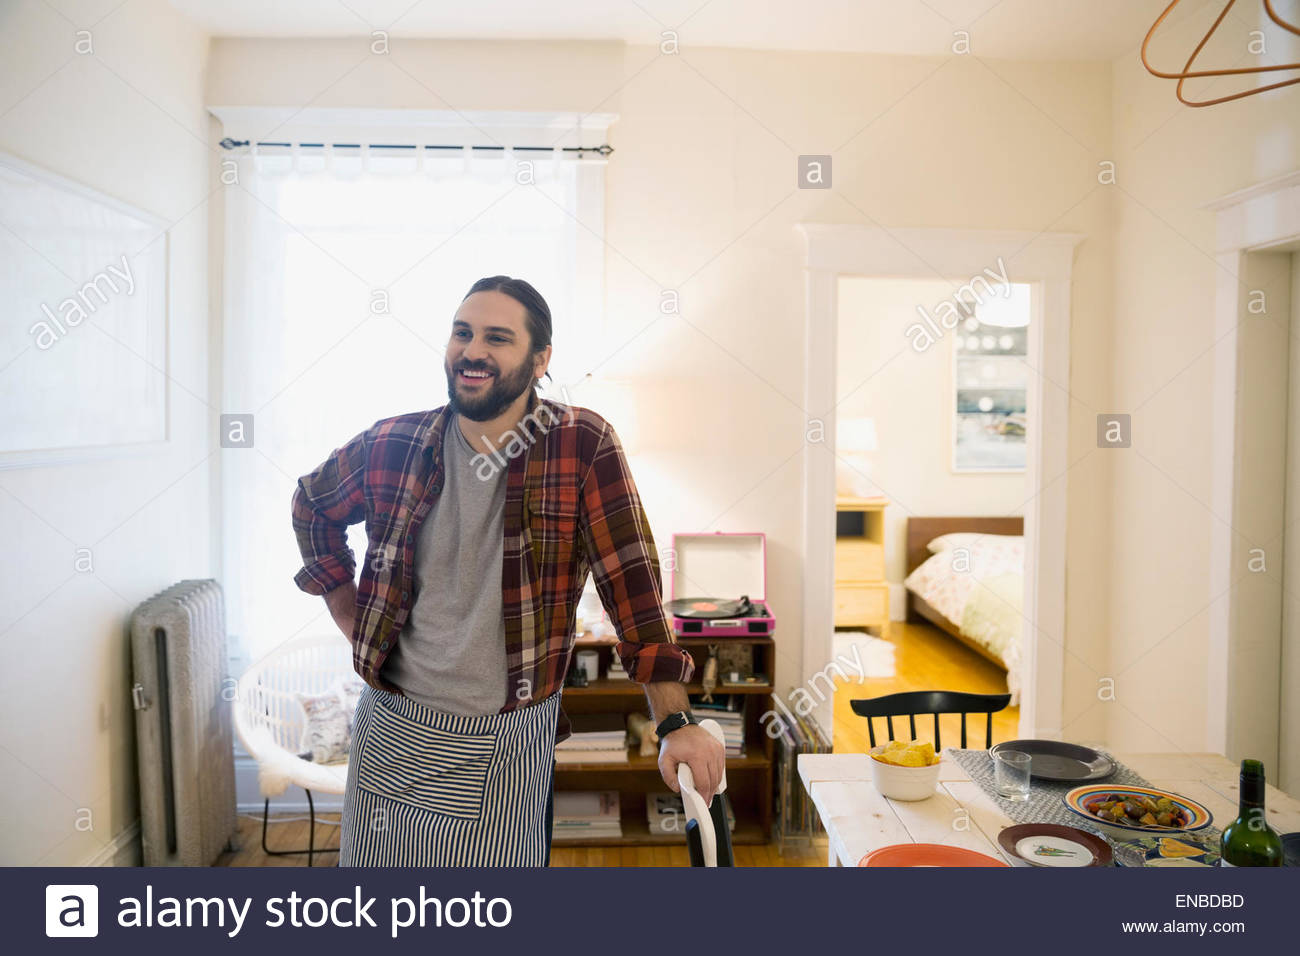 Portrait smiling man preparing for dinner party - Stock Image